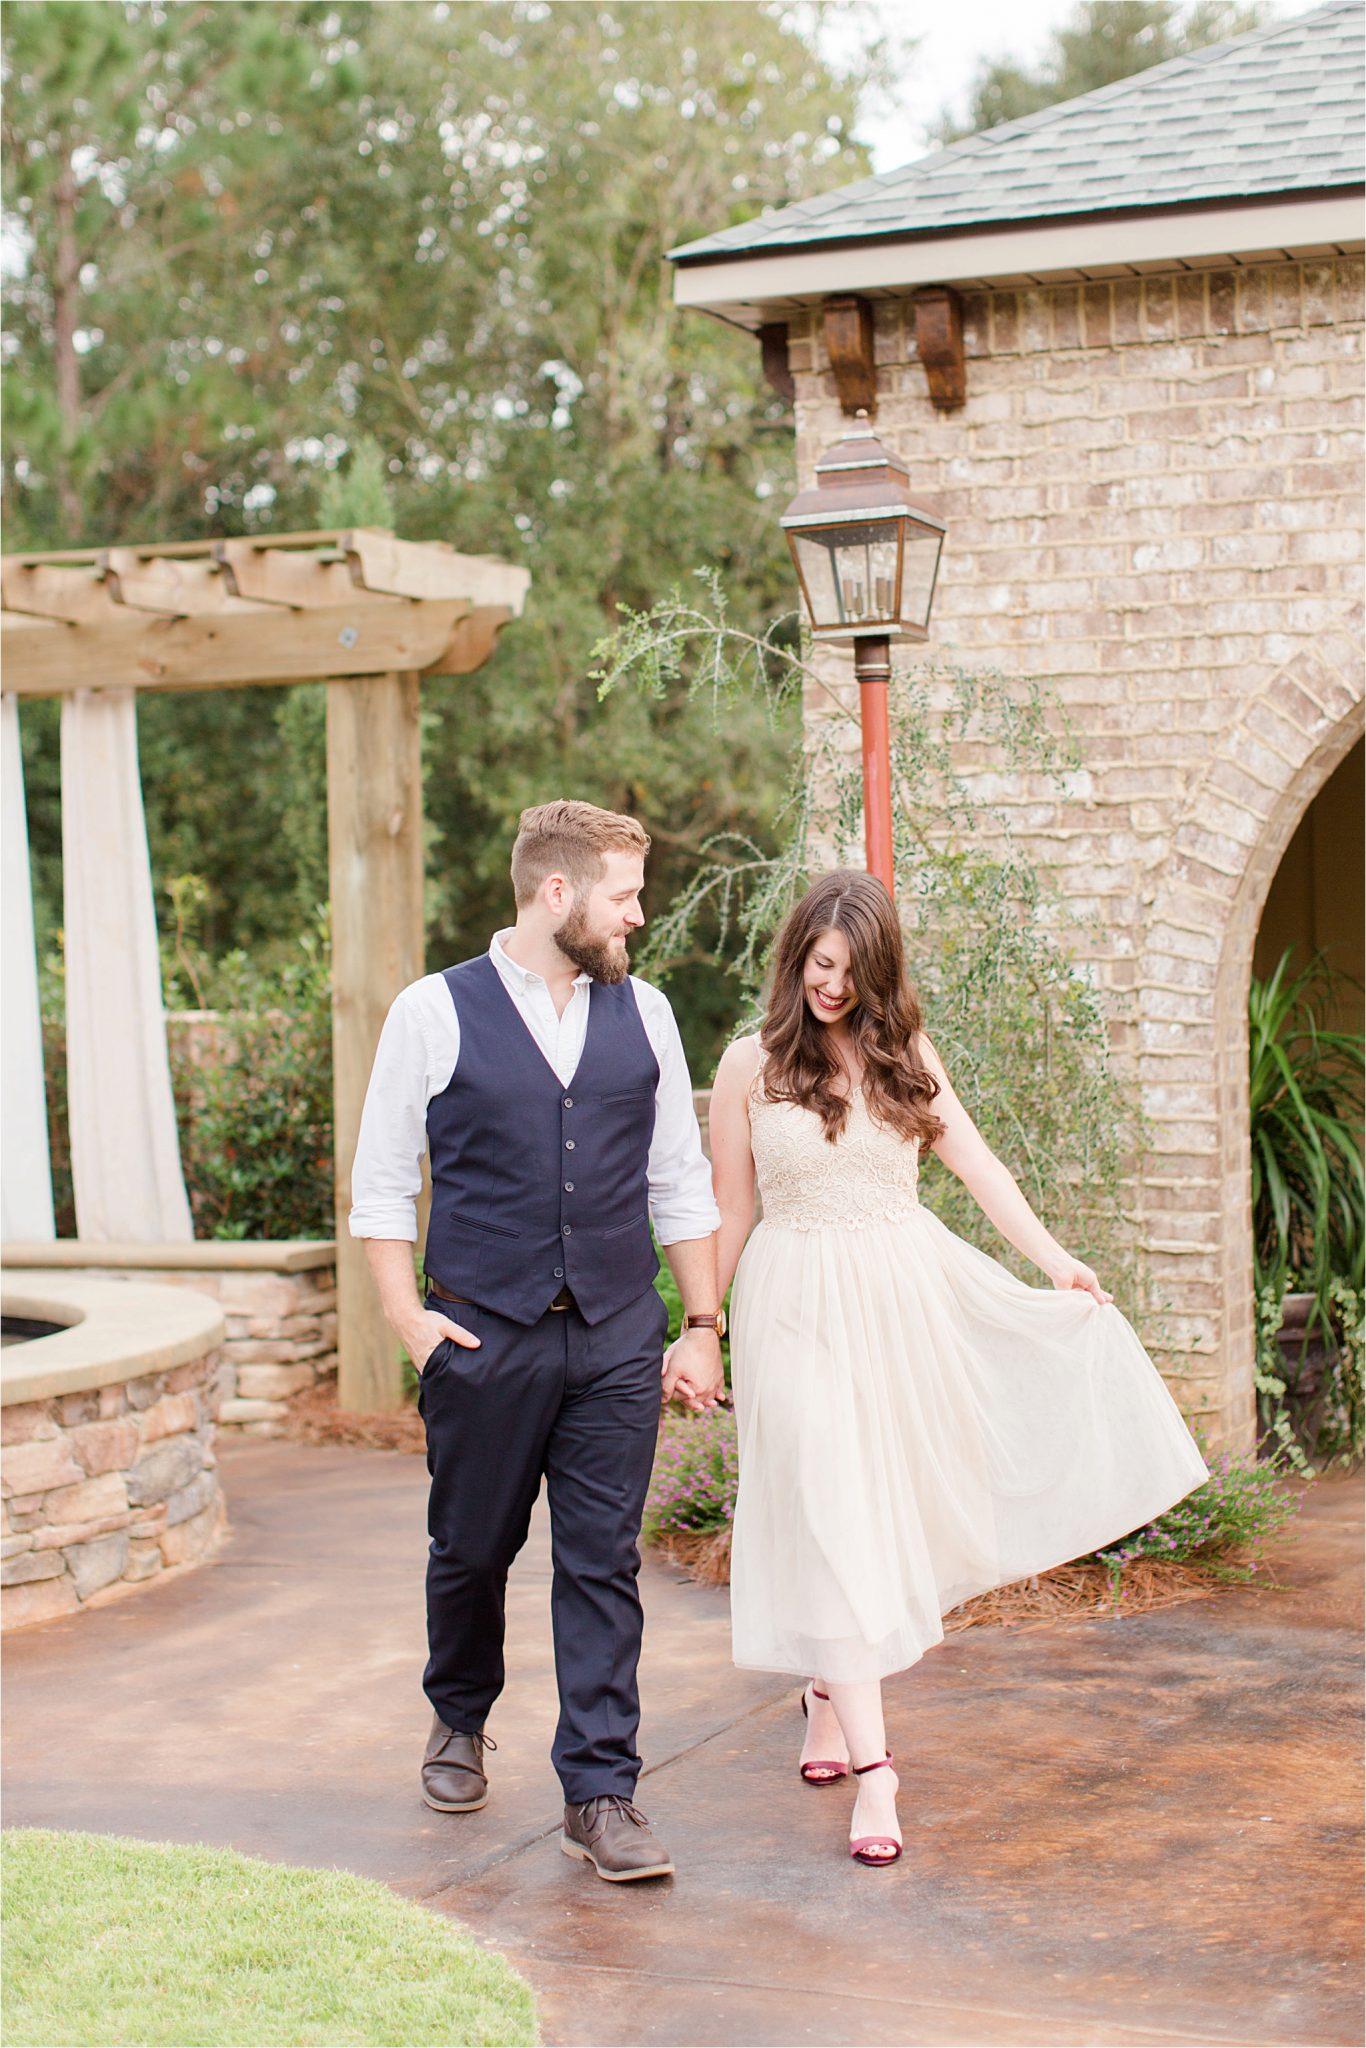 rehearsal-dinner-bride-groom-shoes-velvet-dress-bella-sera-gardens-Alabama-venue